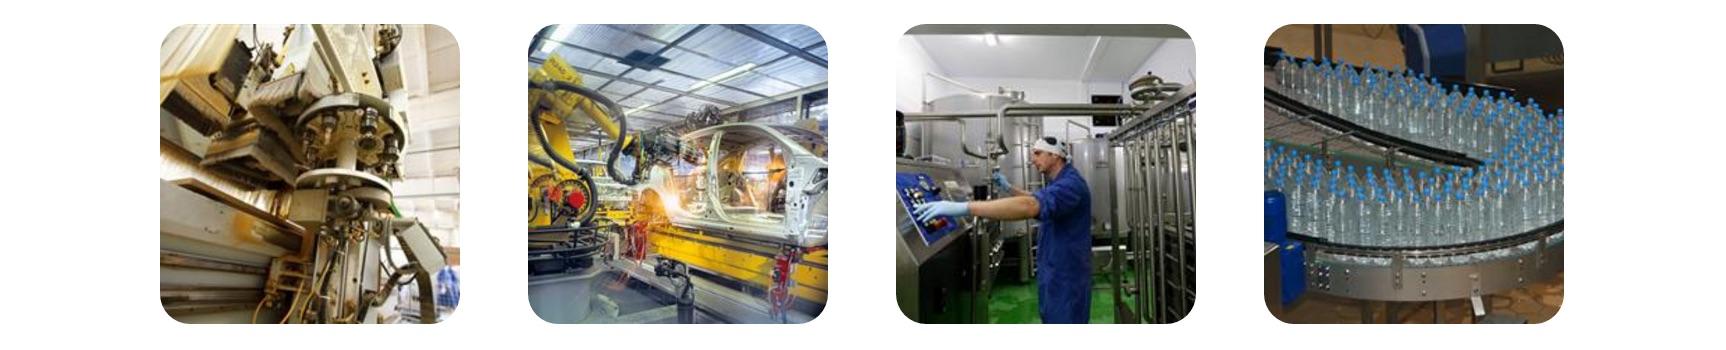 Equipment Appraisals   Machinery Appraisers   Certified ...